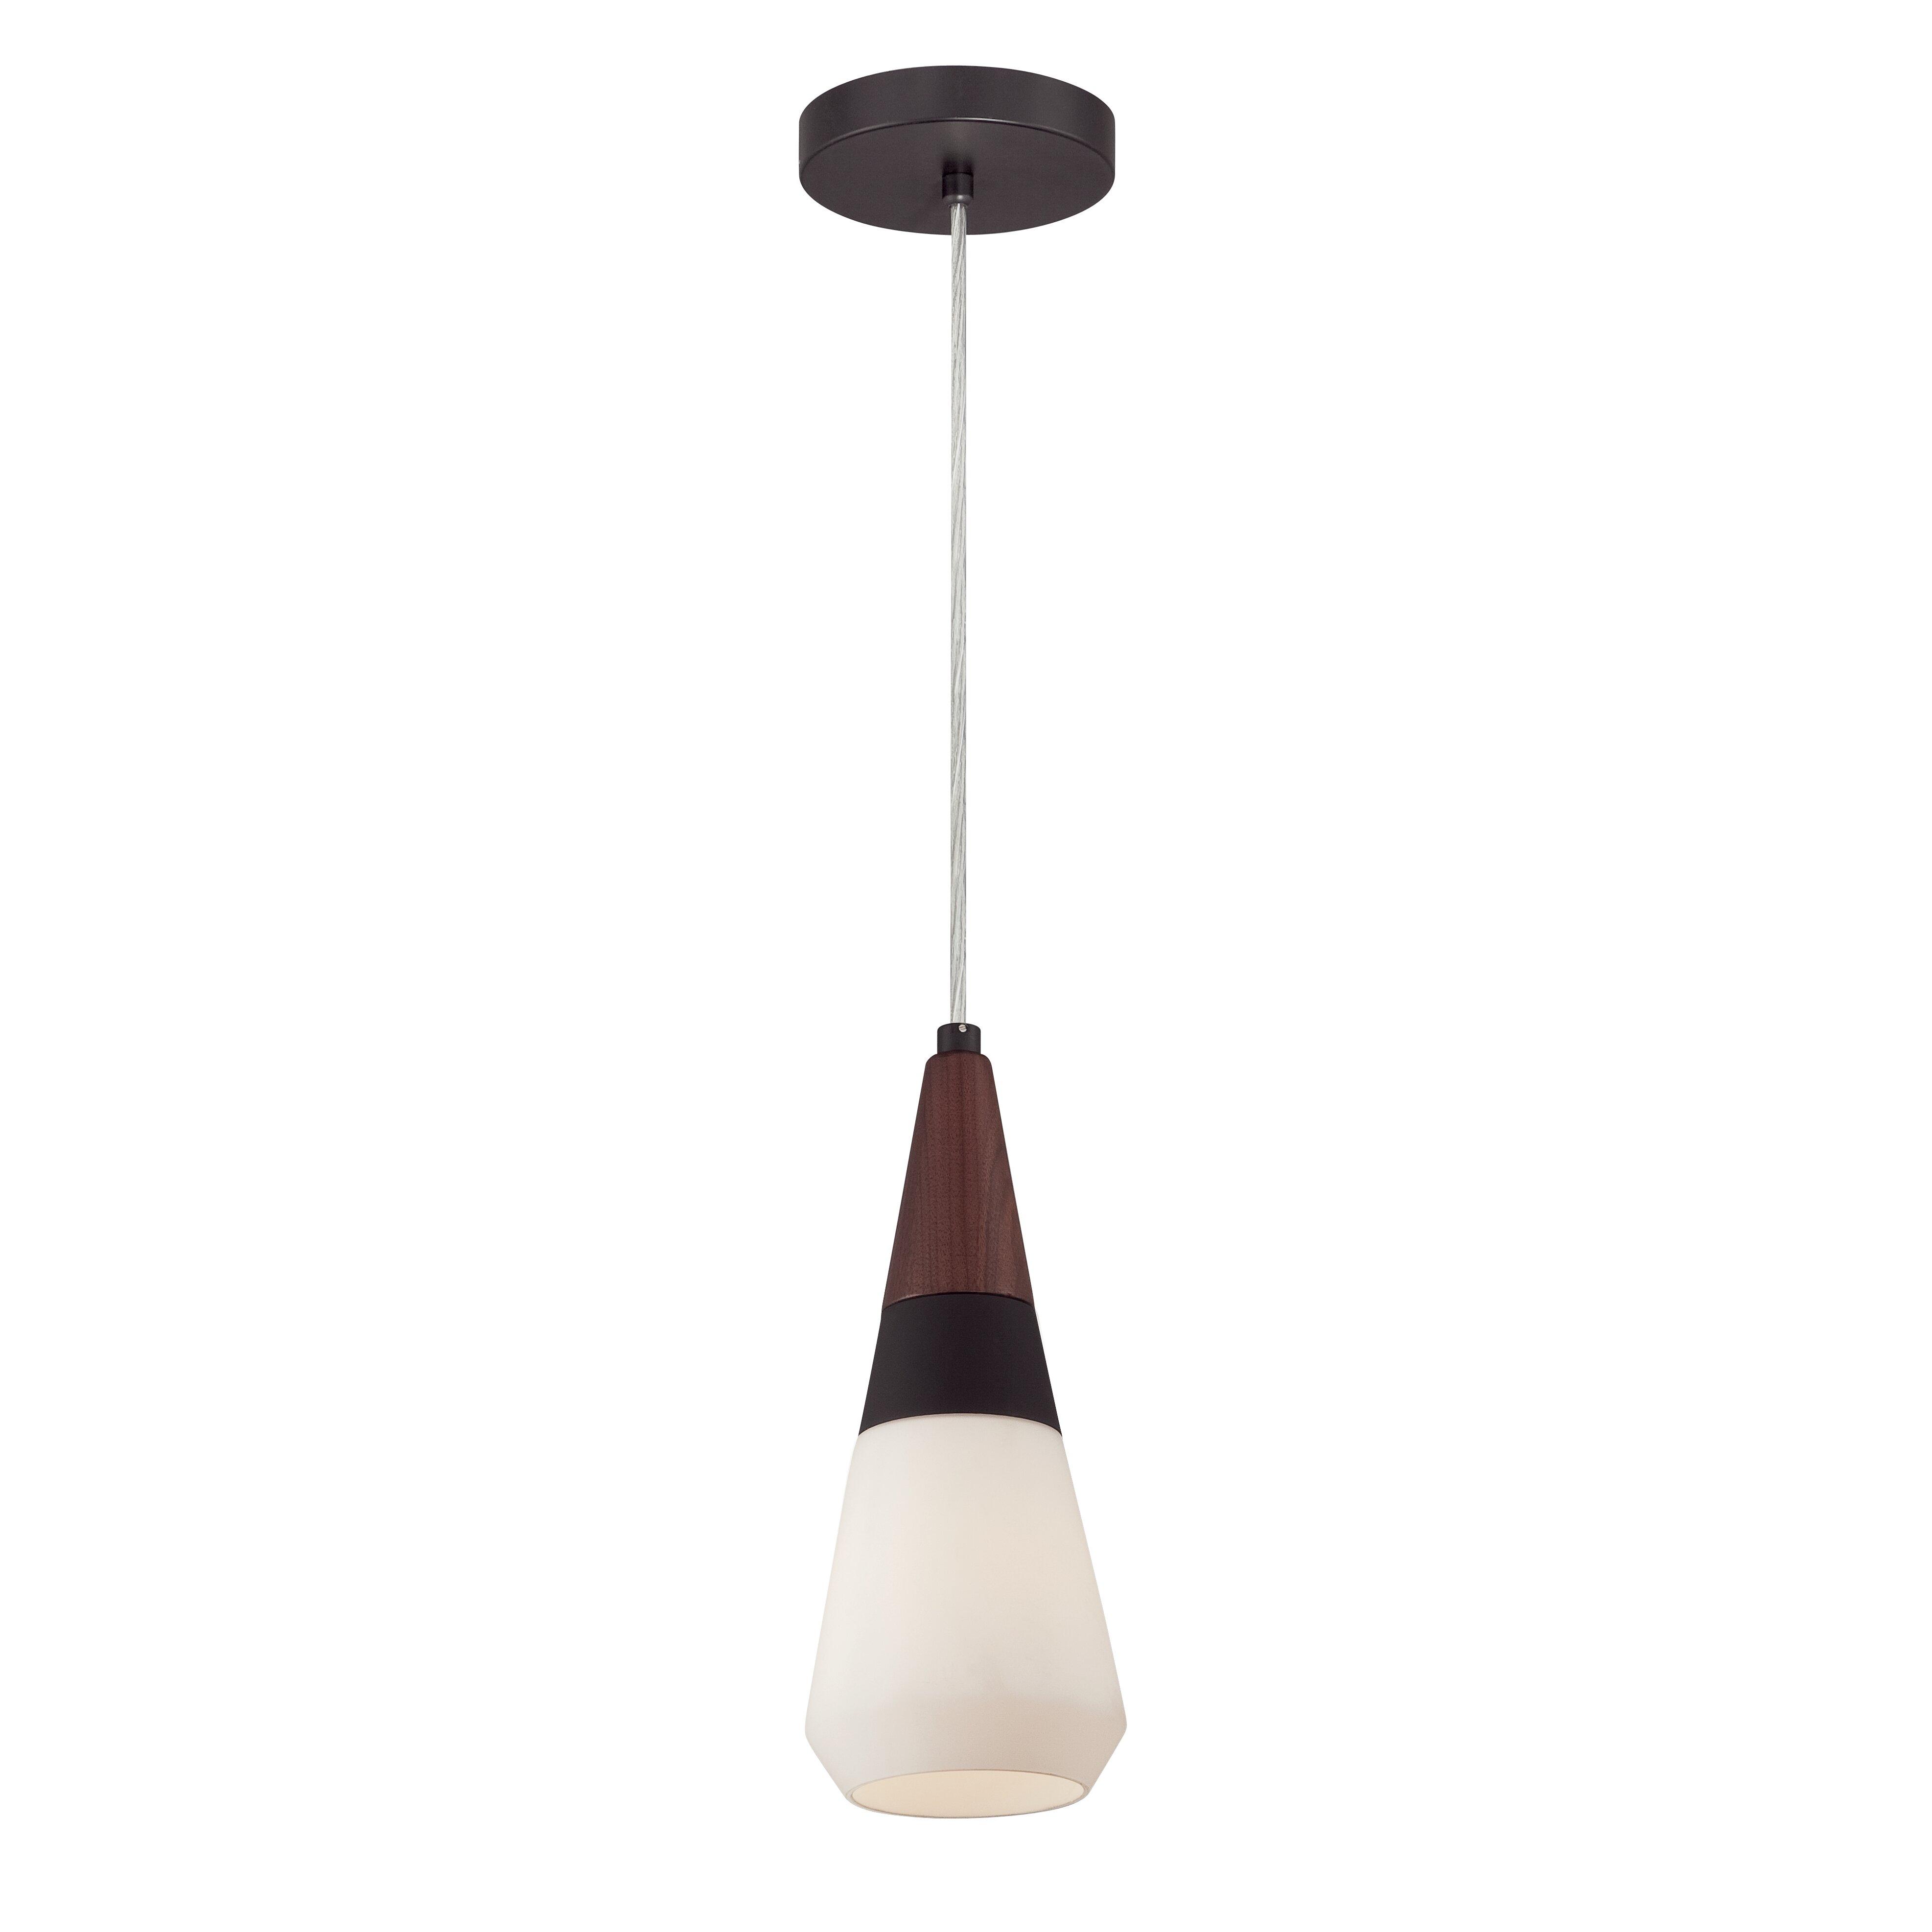 philips consumer luminaire rustique 1 light mini pendant reviews wayfair. Black Bedroom Furniture Sets. Home Design Ideas